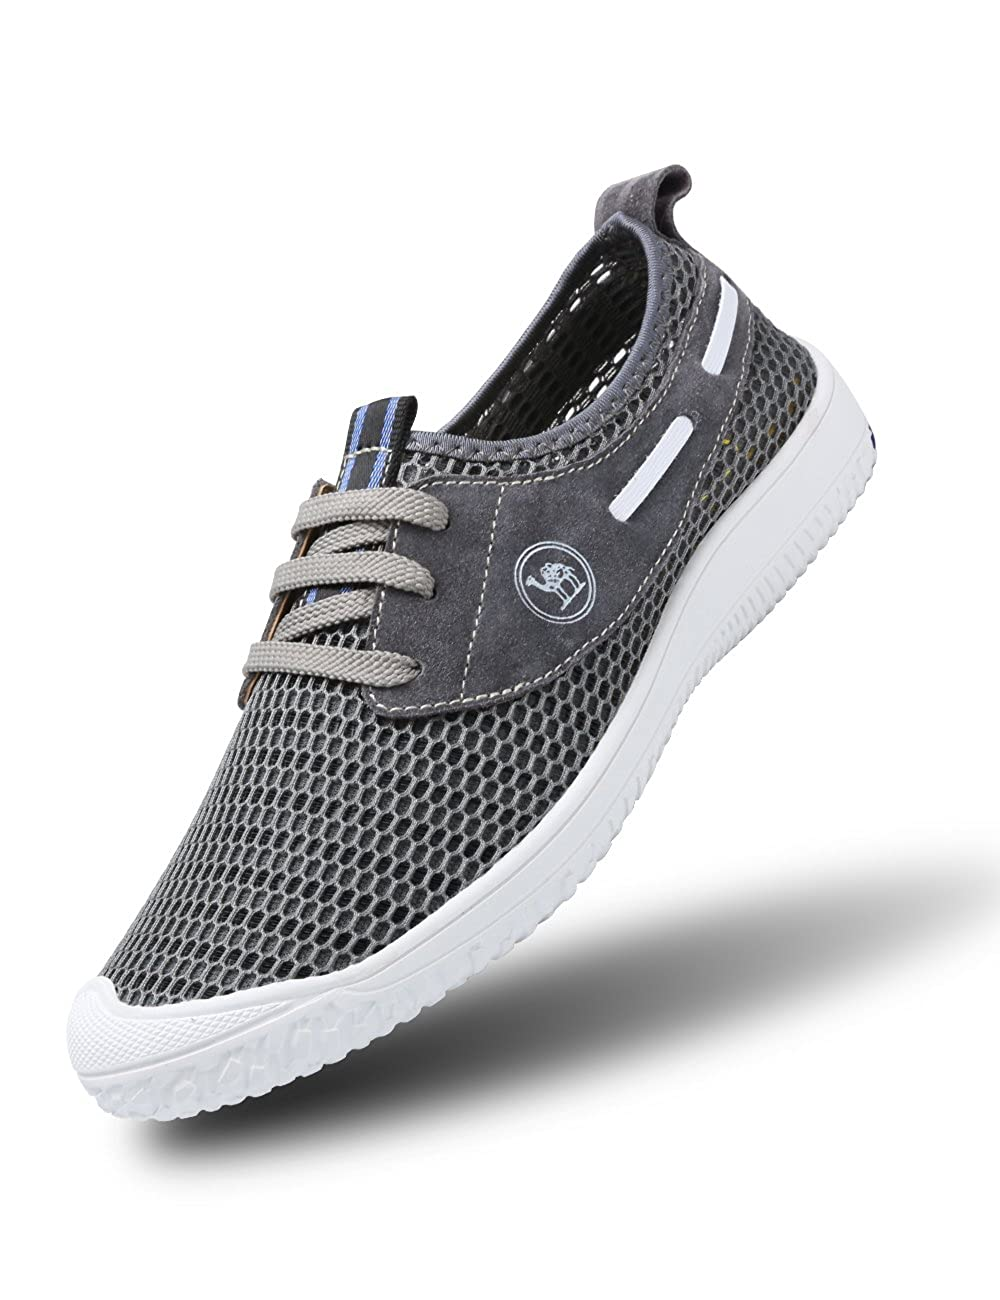 Nike Women's Running Shoes Cozy Anti skidding Light Weight Slip on Shoes